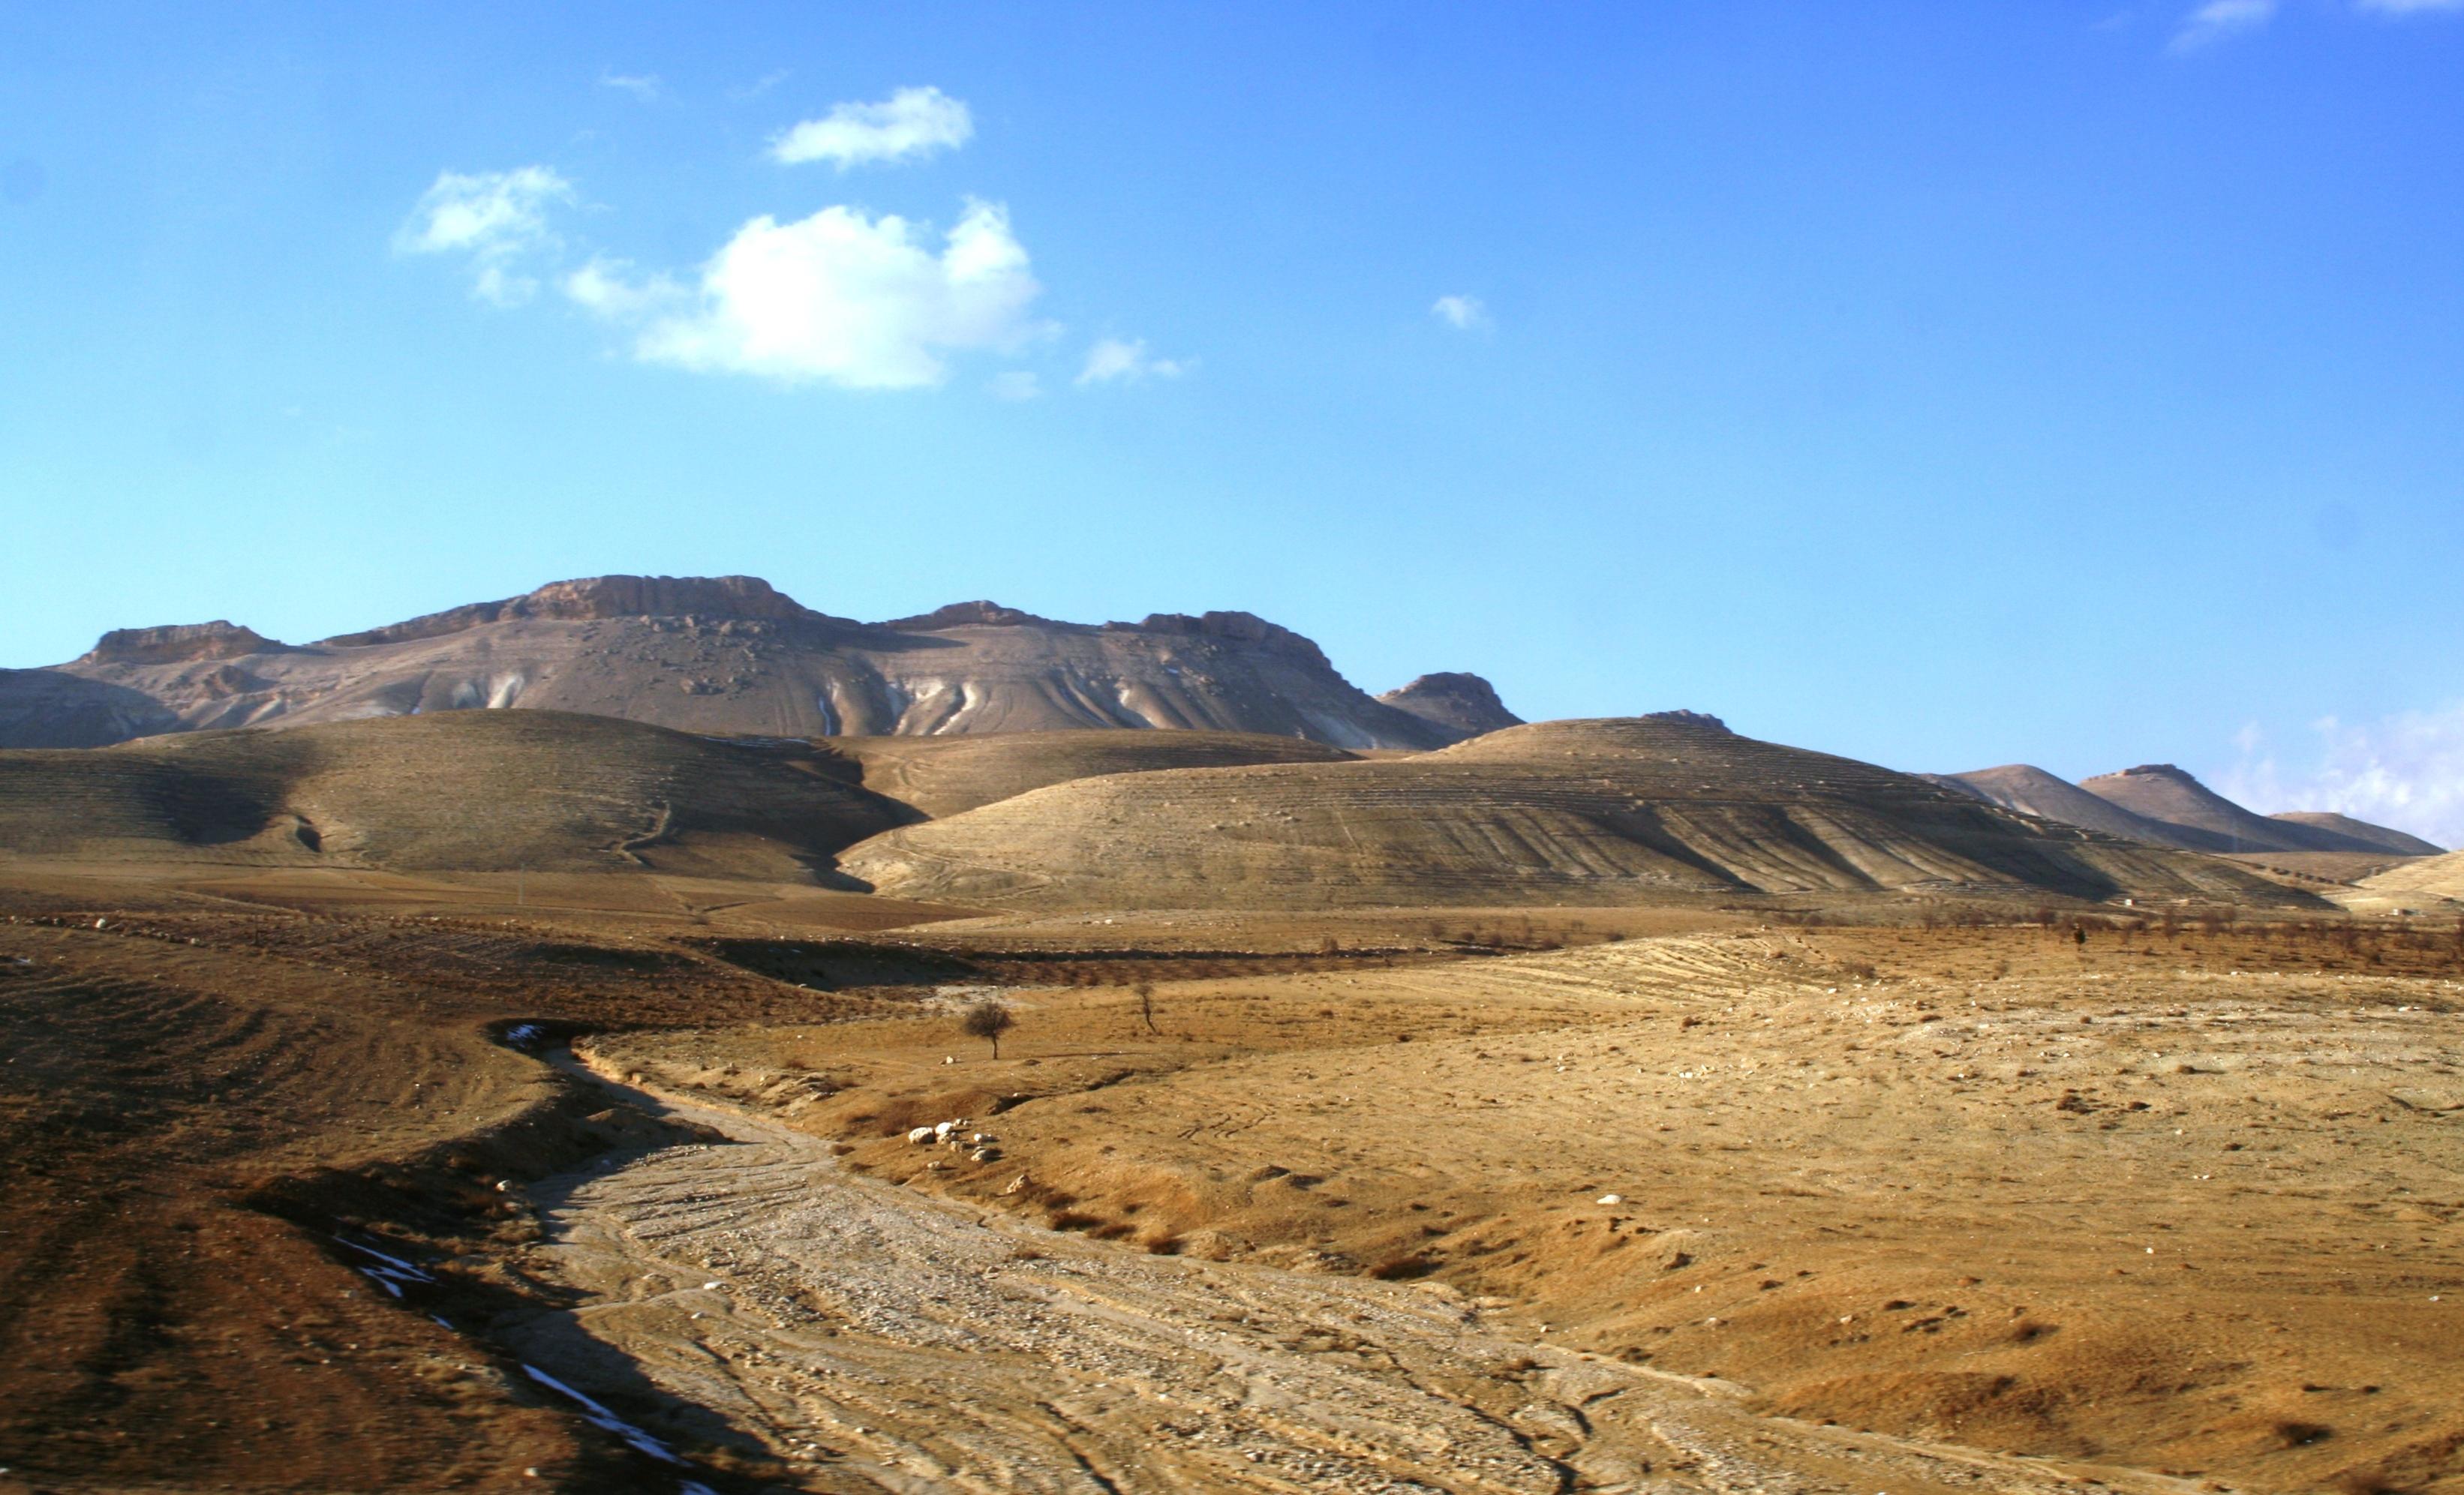 Syrian landscape | Flickr - Photo Sharing!